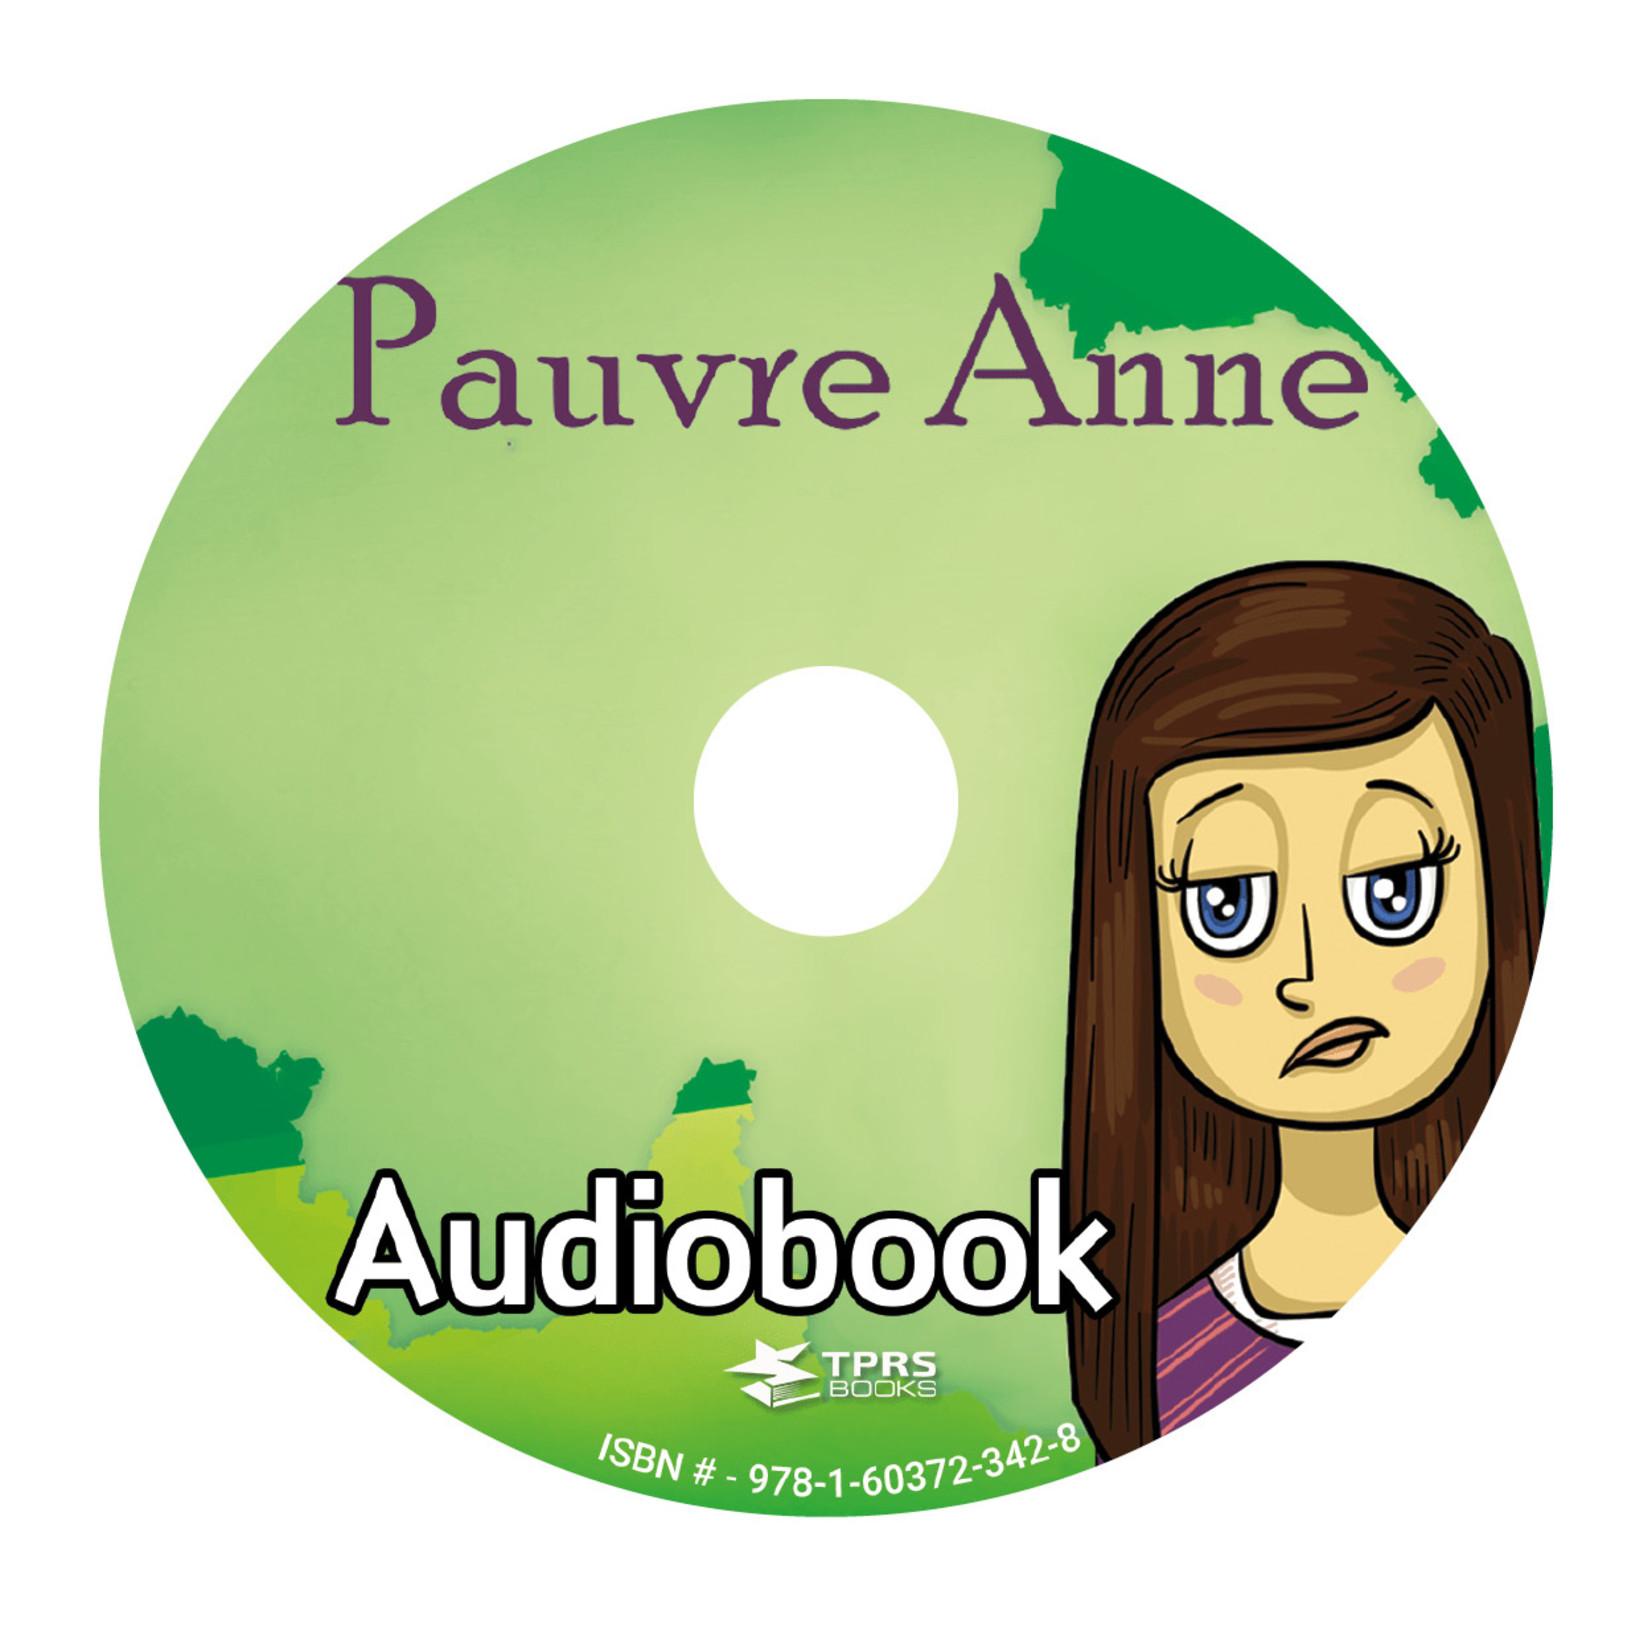 TPRS Books Pauvre Anne - Audiobook